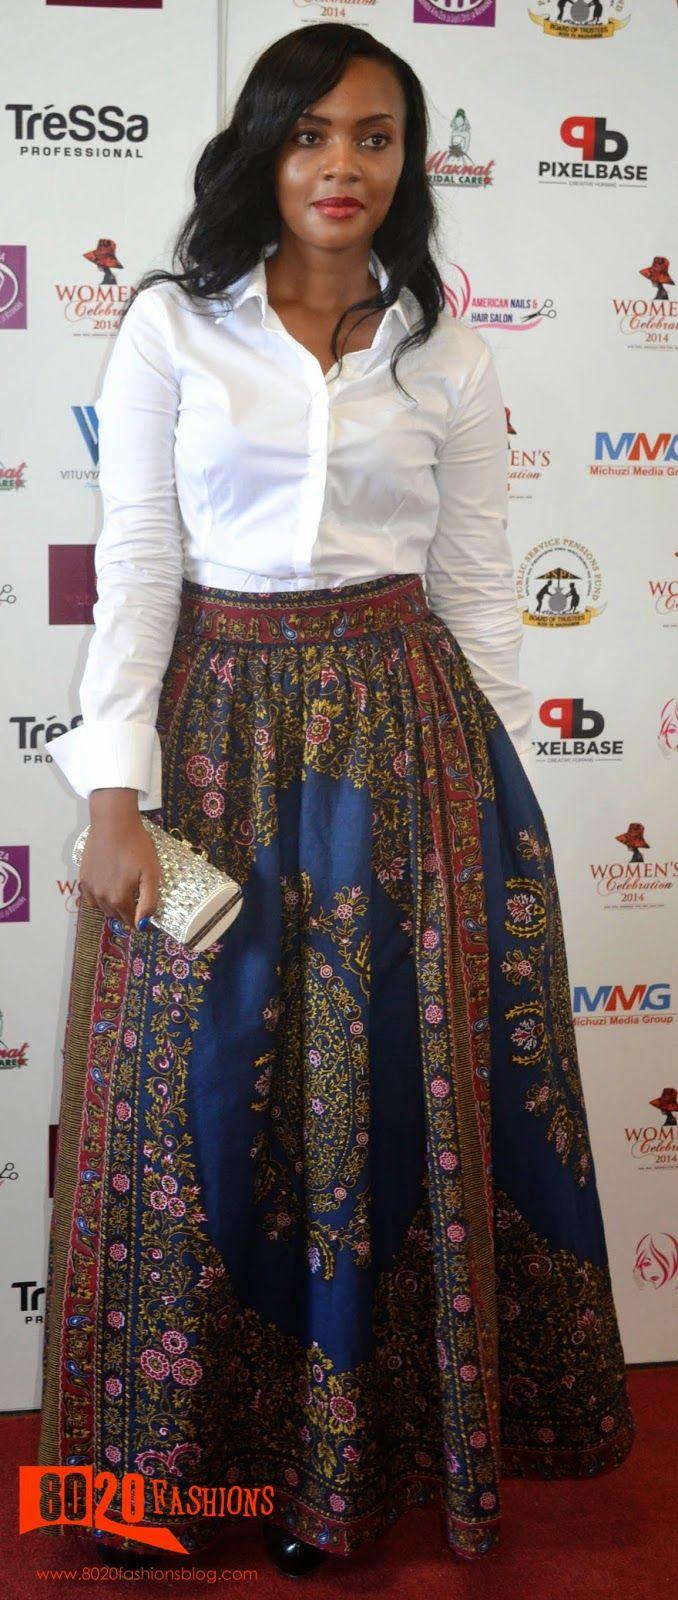 Kiki 39 S Fashion Ethnic Ankara Designs Pinterest Red Carpets Maxi Skirts And Skirts